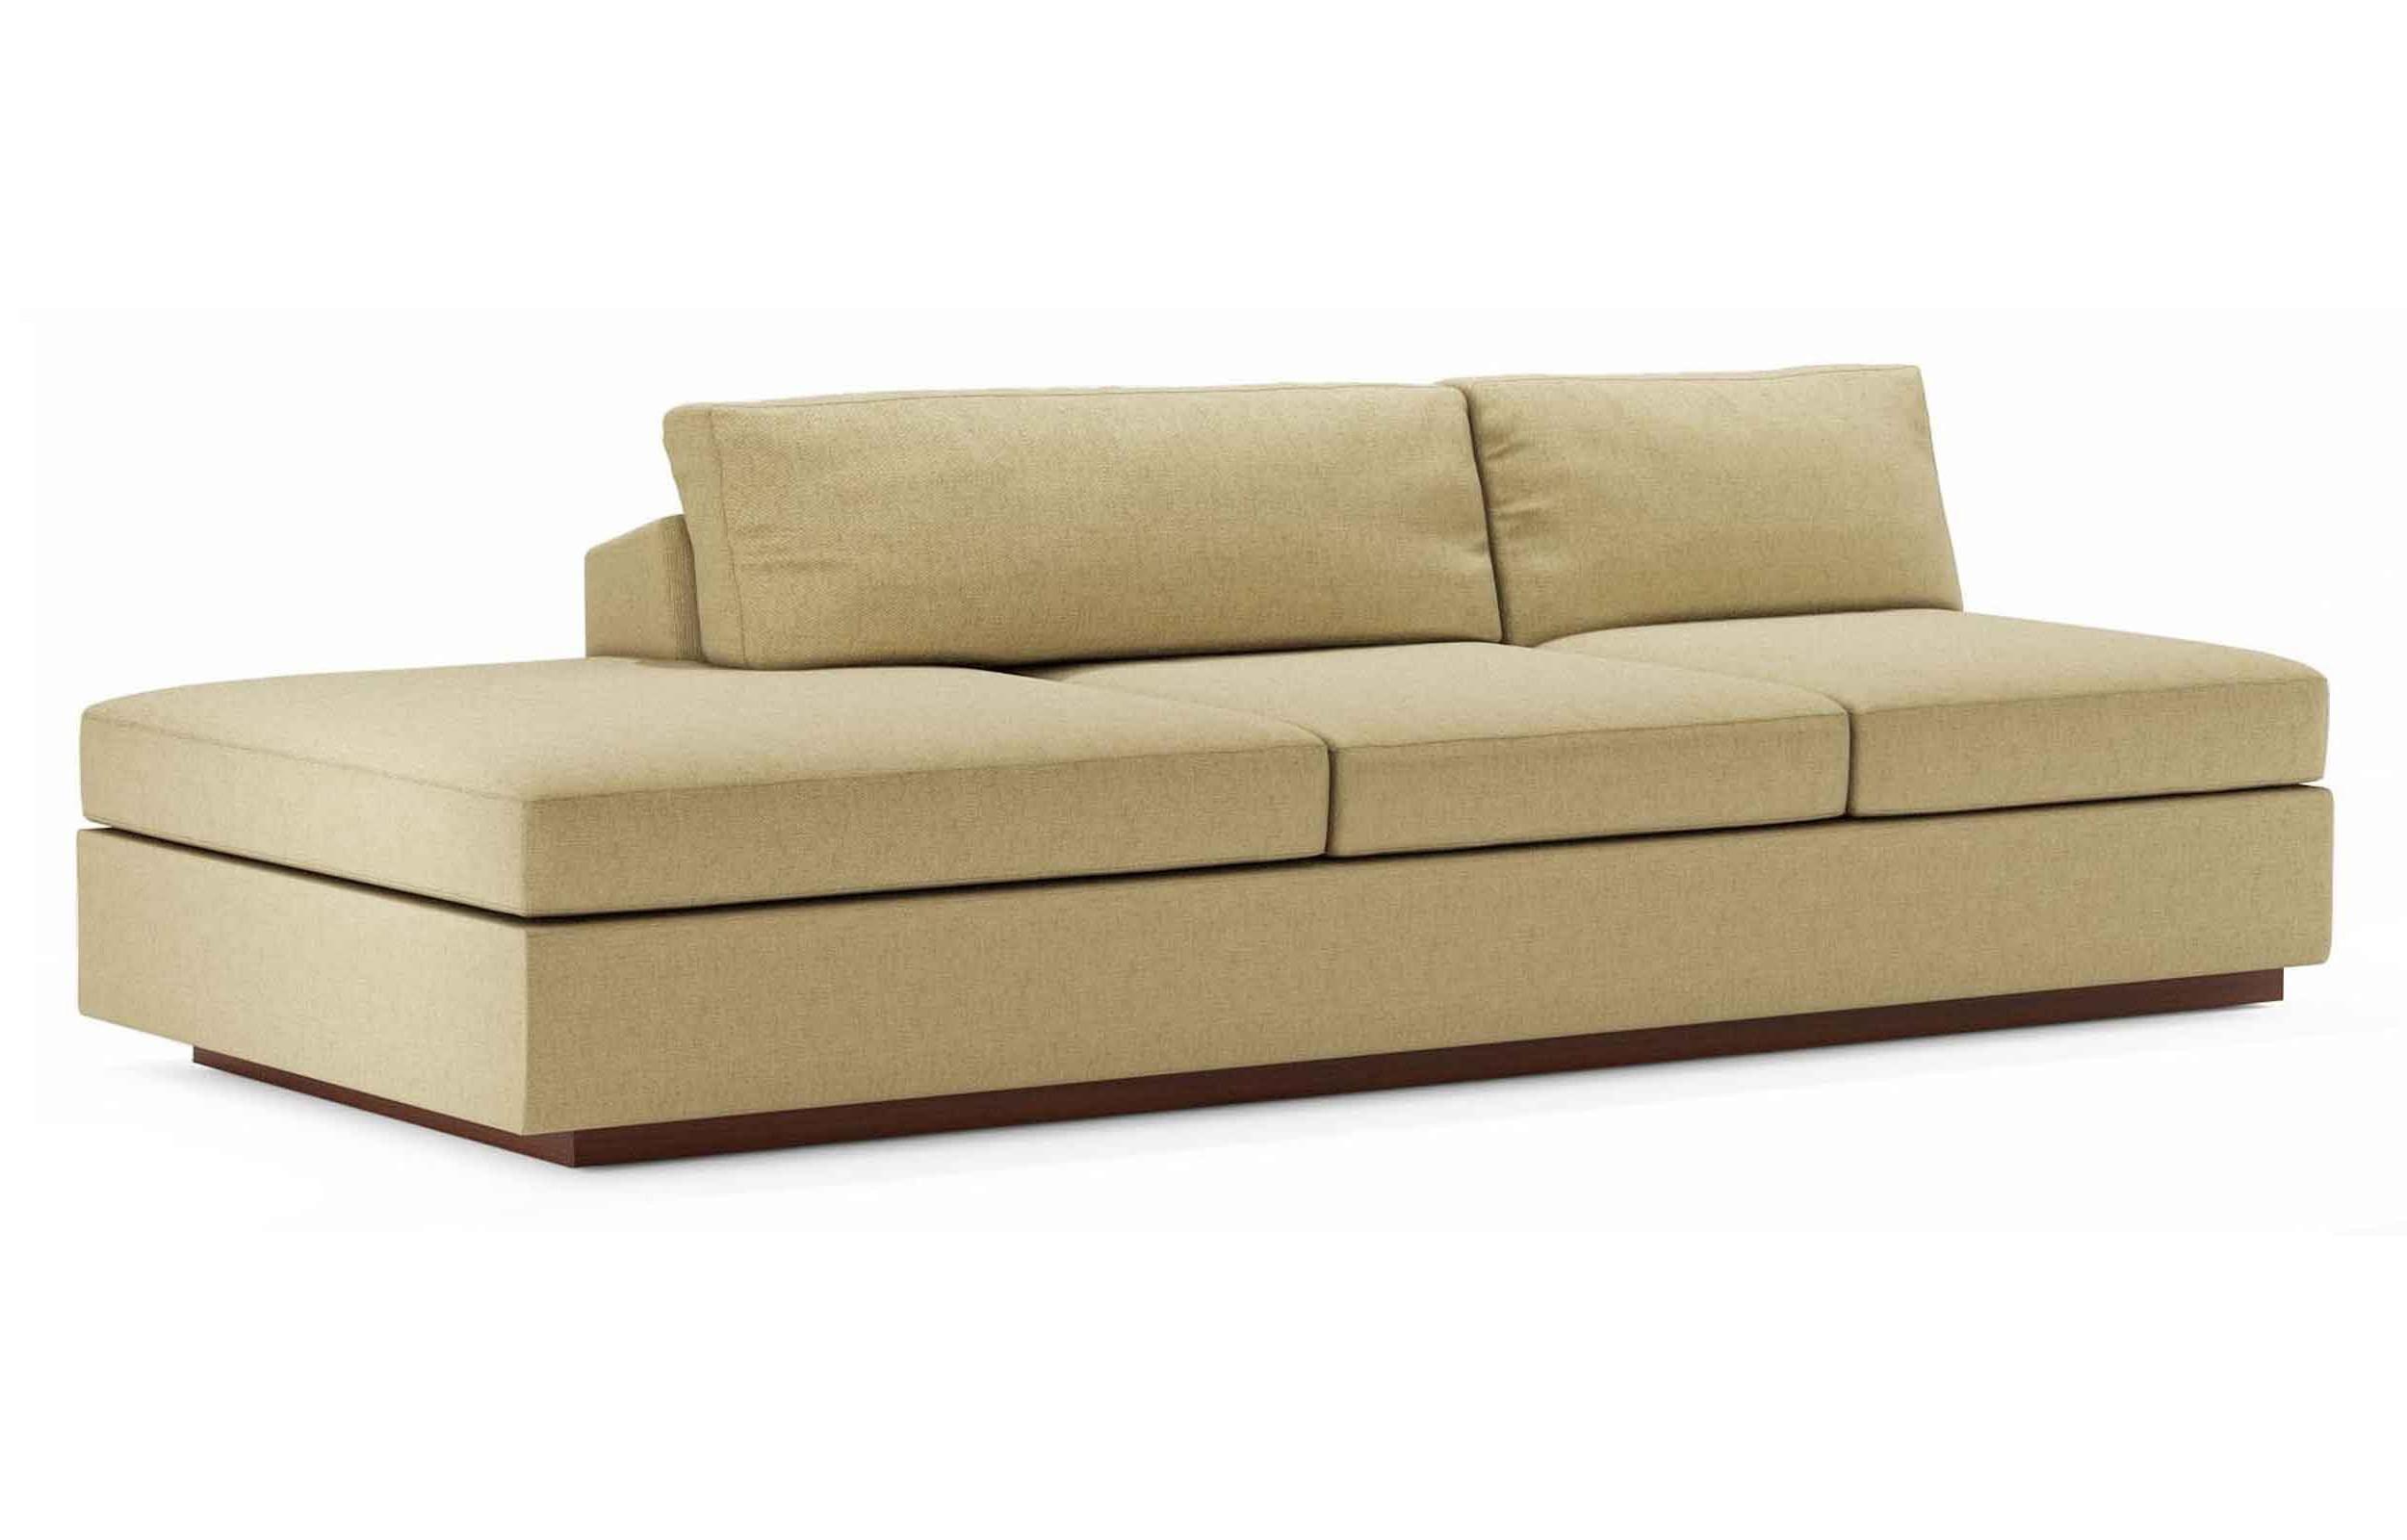 Furniture: Small Armless Sofa | Skyline Settee | Armless Settee With Regard To Small Armless Sofa (View 10 of 20)